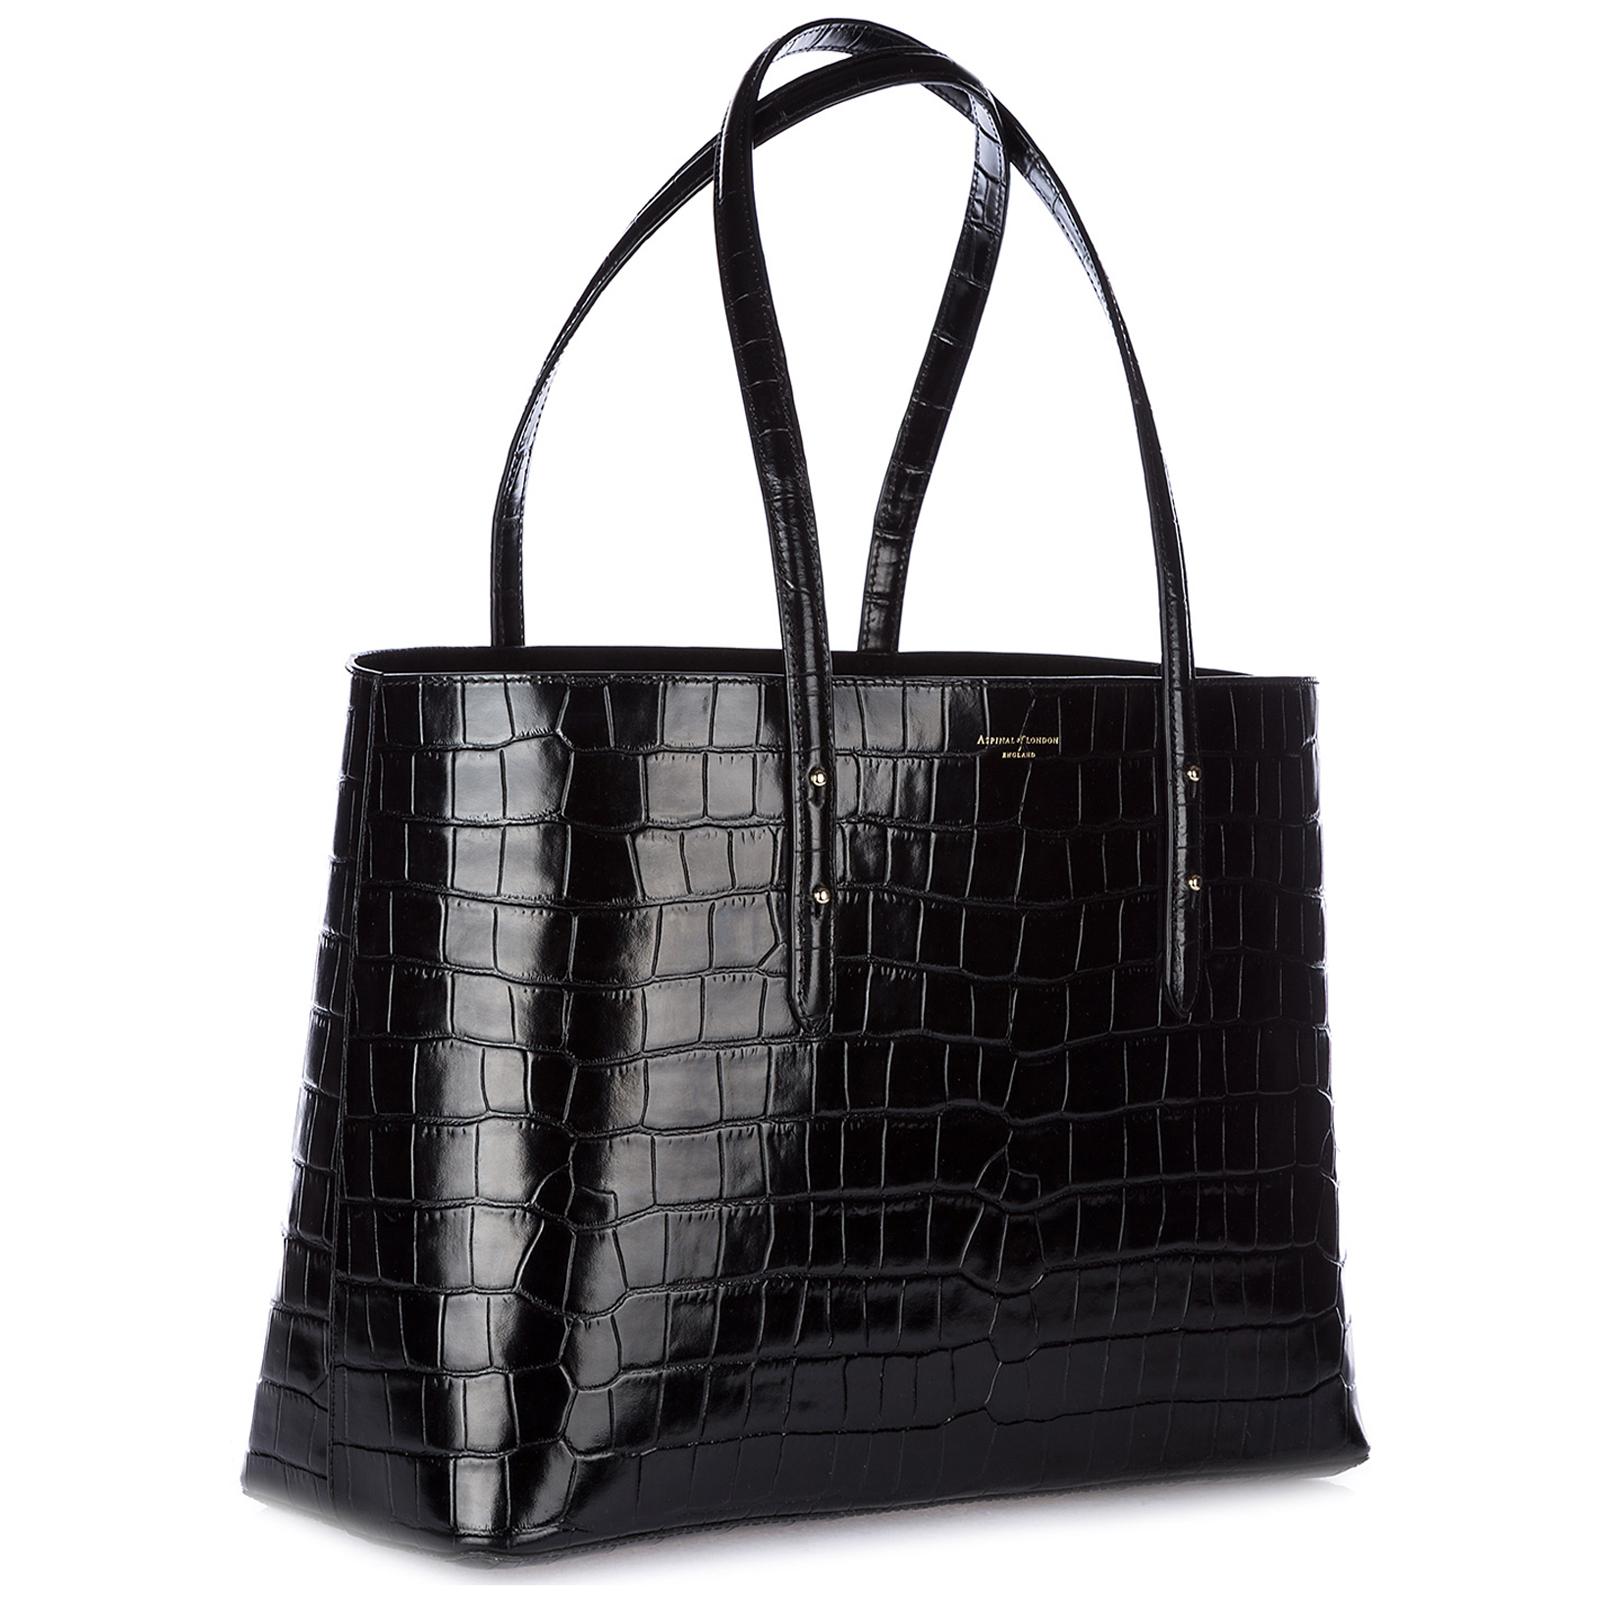 Handbag Aspinal of London 0421848183427BLK deep shine black croc ... 87f4a9ff7608e